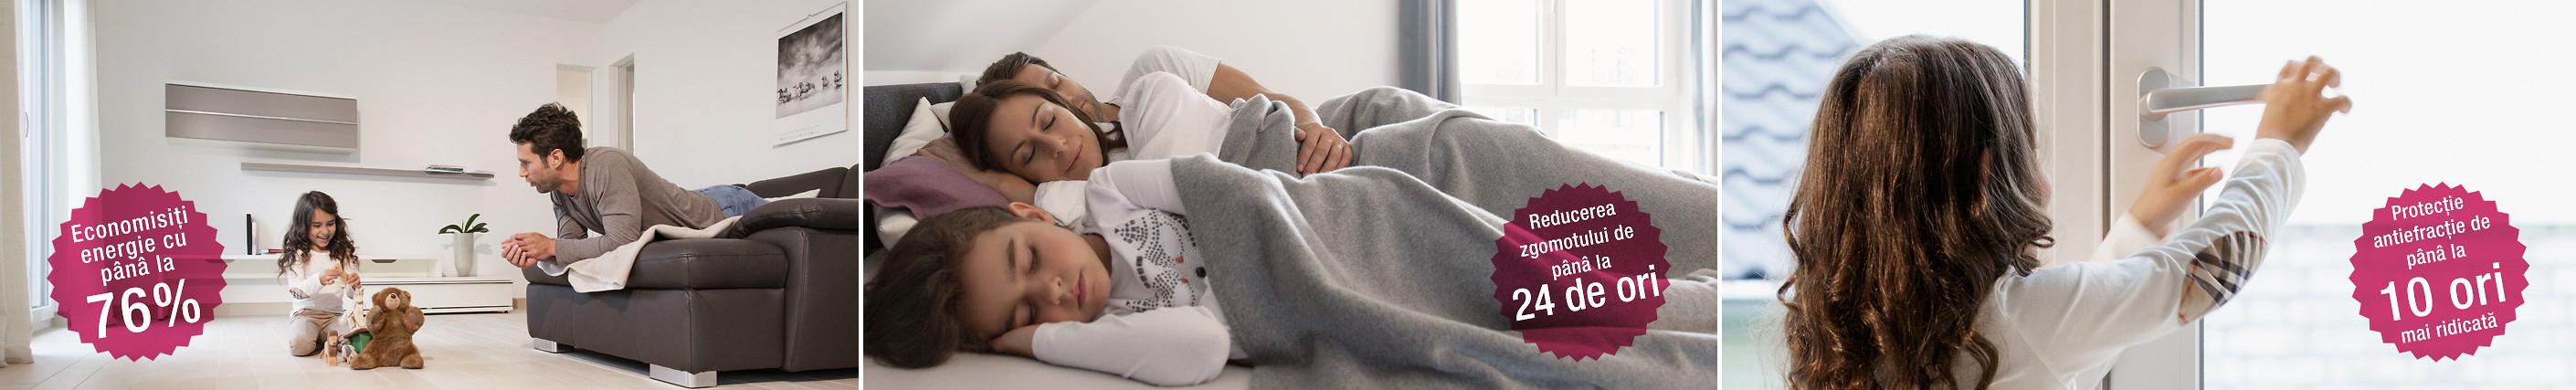 kunststofffenster rehau kunststofffenster t ren rehau kunststofffenster sterreich. Black Bedroom Furniture Sets. Home Design Ideas